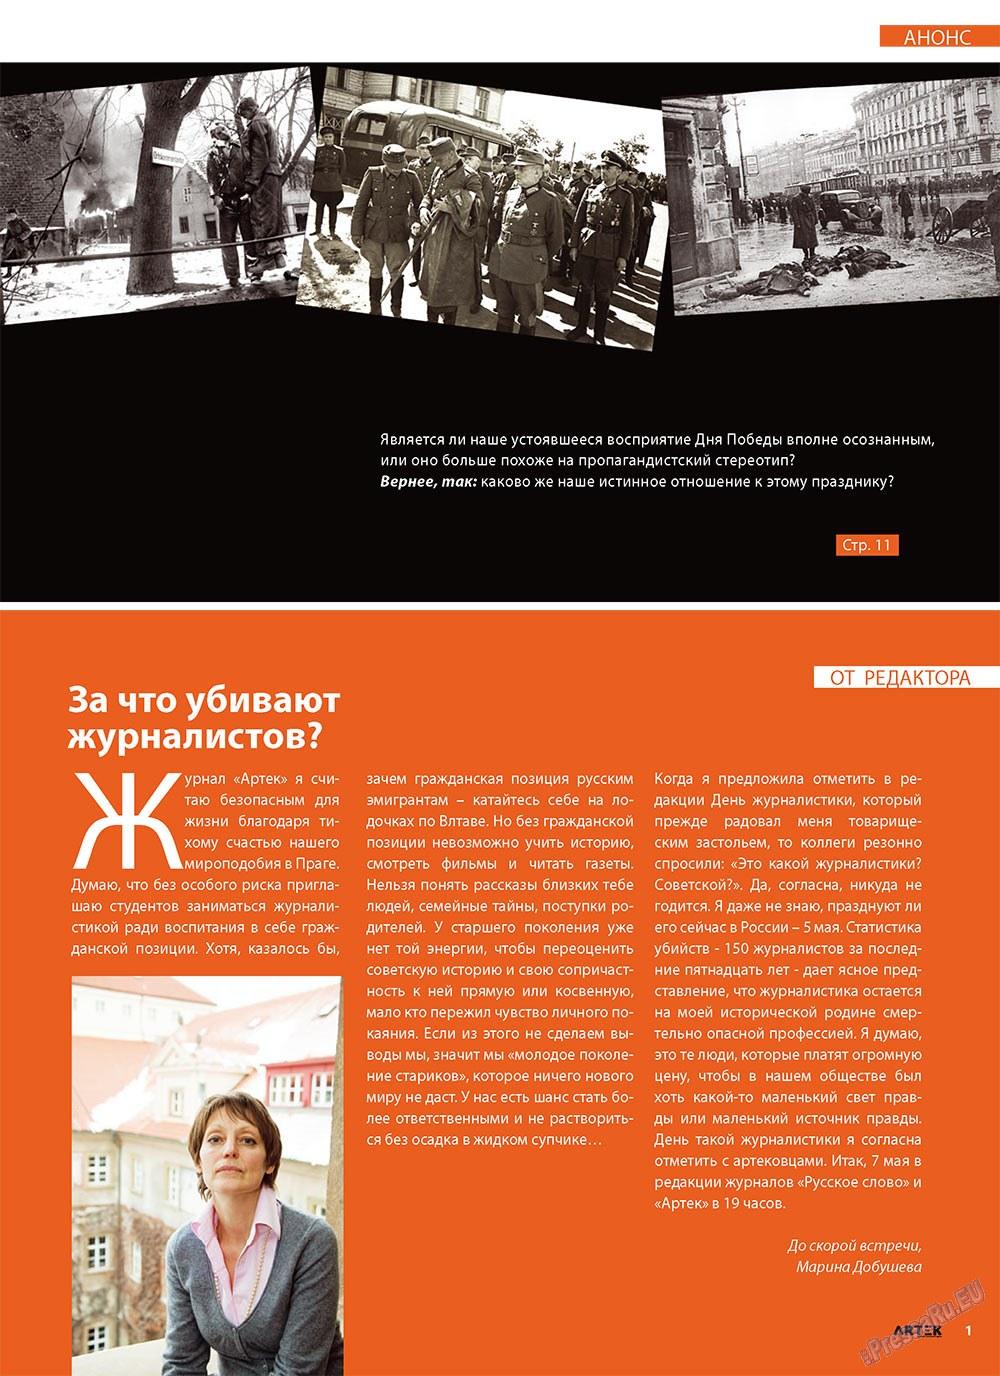 Артек (журнал). 2010 год, номер 2, стр. 3